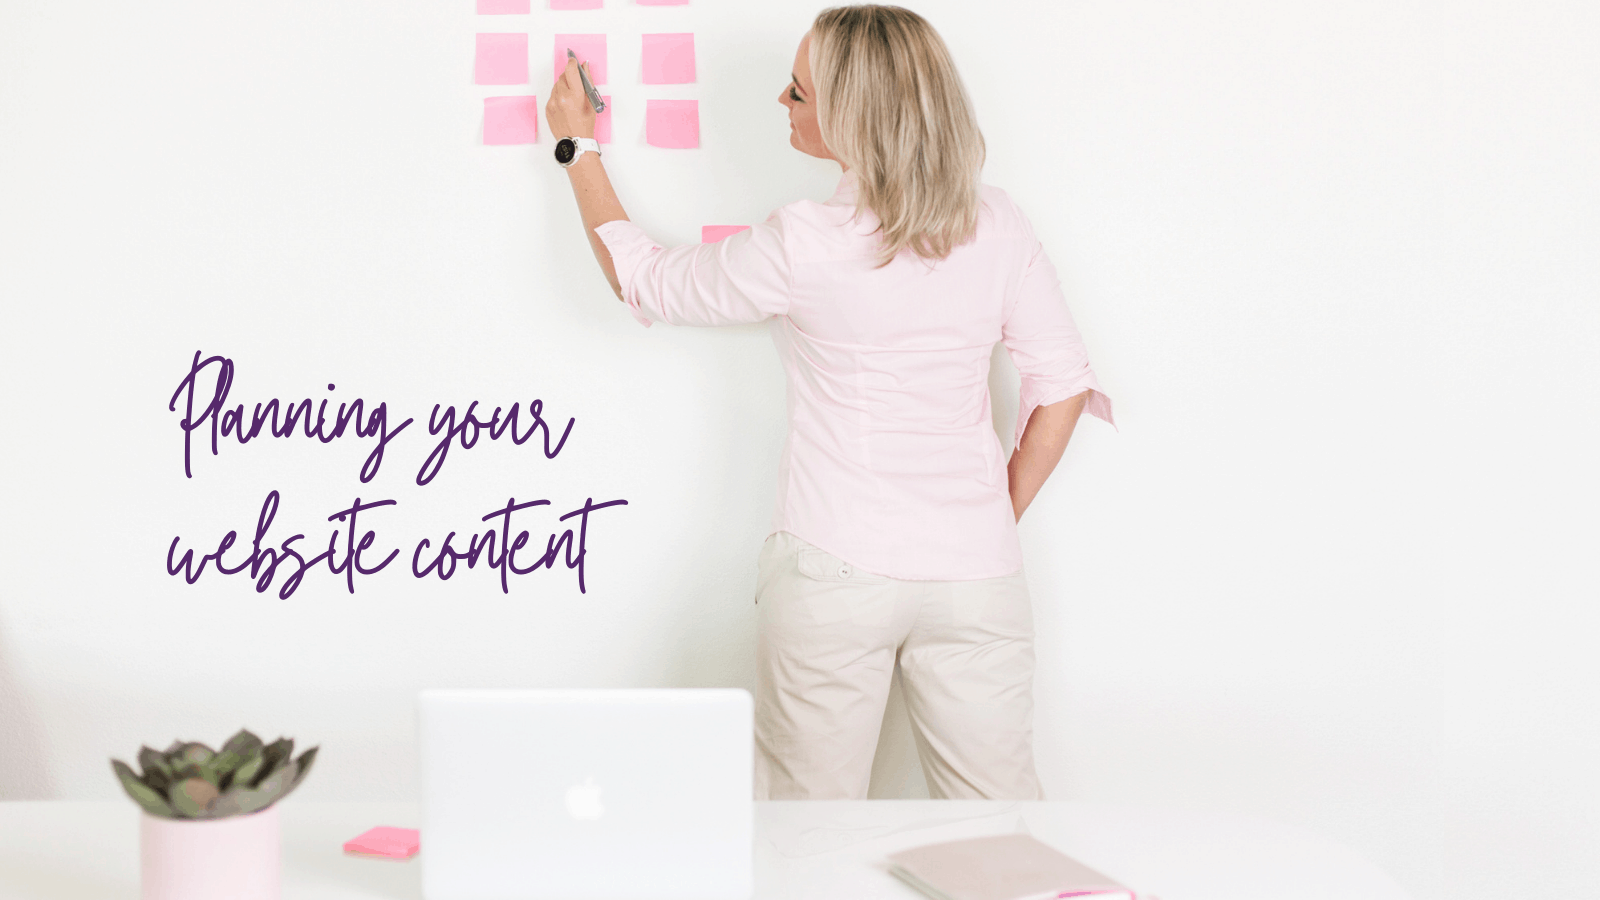 planning your website cotent